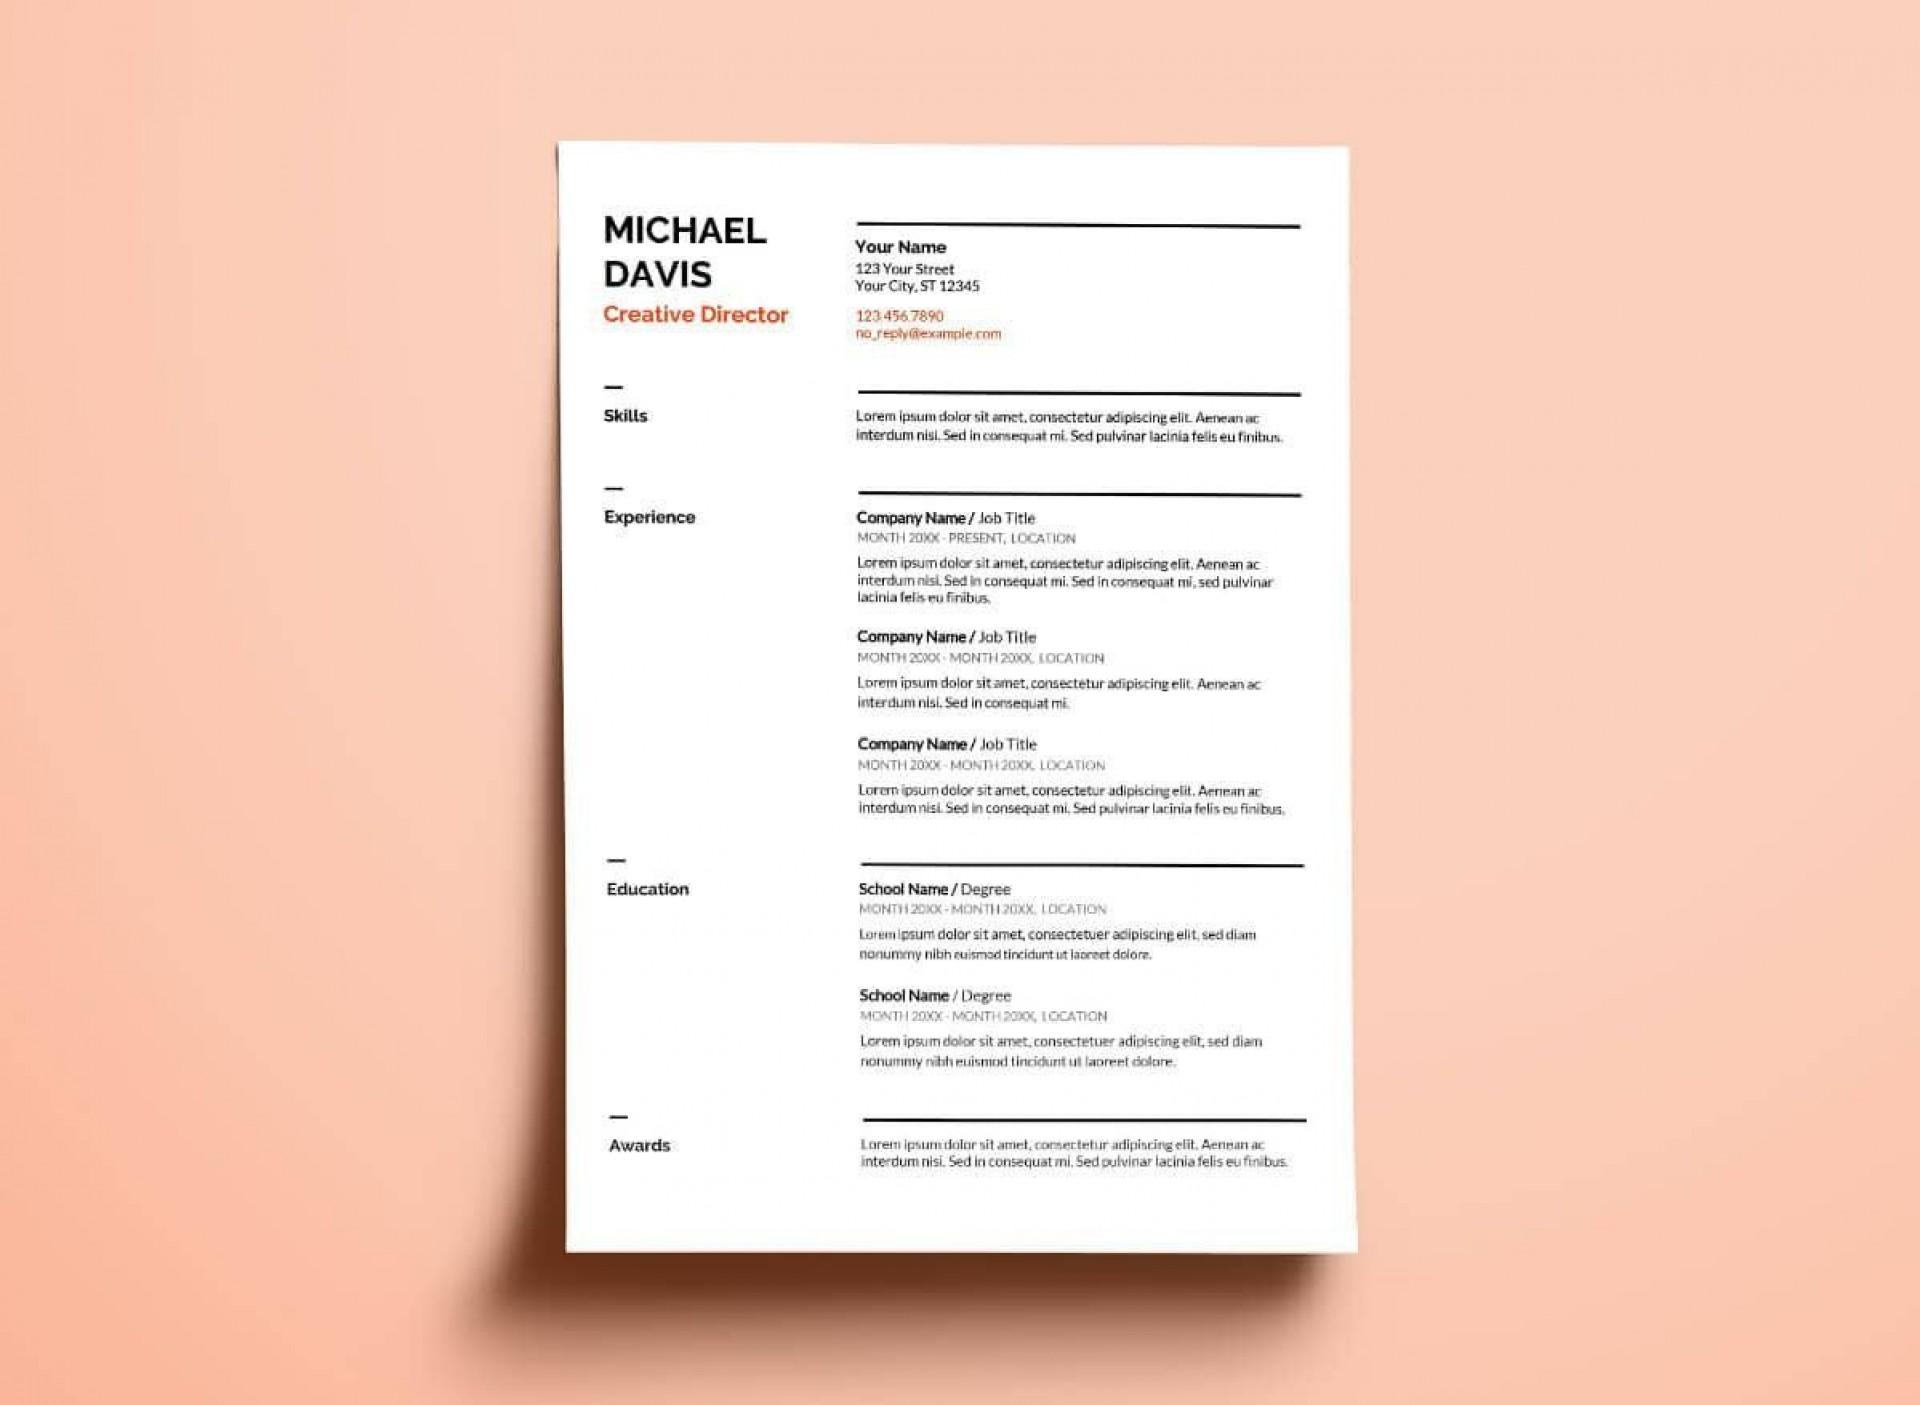 002 Fascinating Entry Level Resume Template Google Doc Image  Docs1920